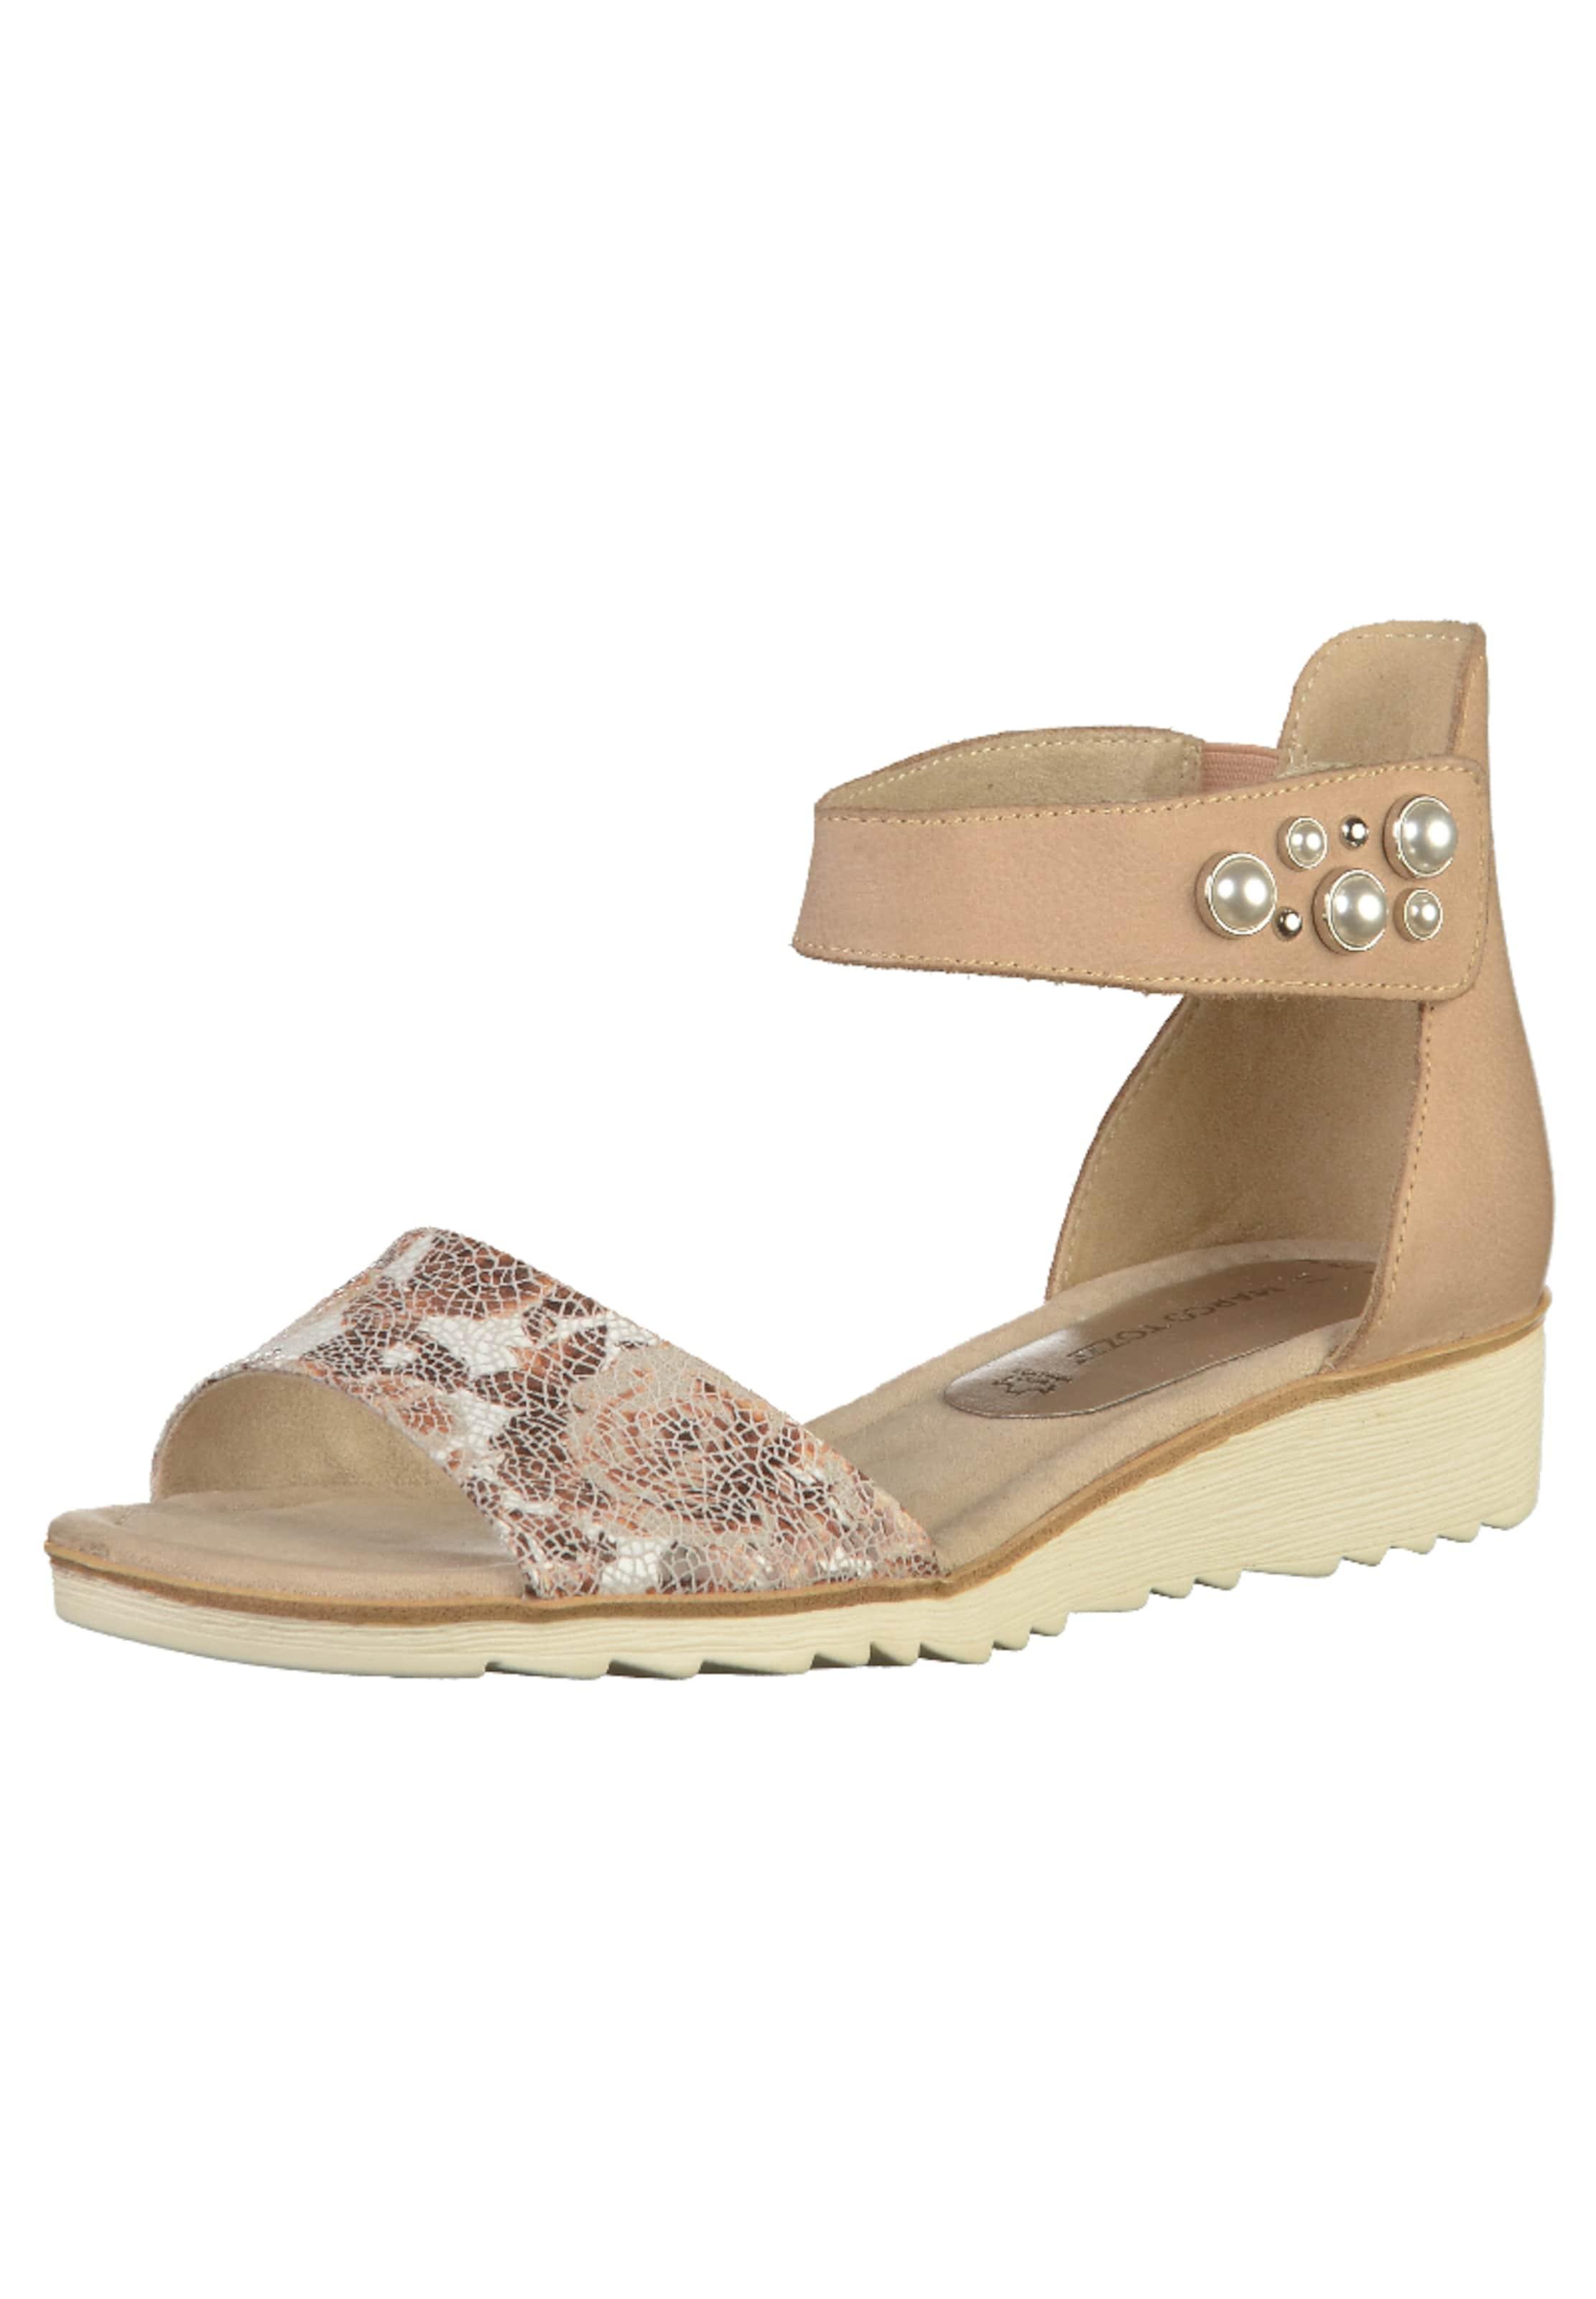 MARCO TOZZI Sandalen Verschleißfeste billige Schuhe fcf5ae